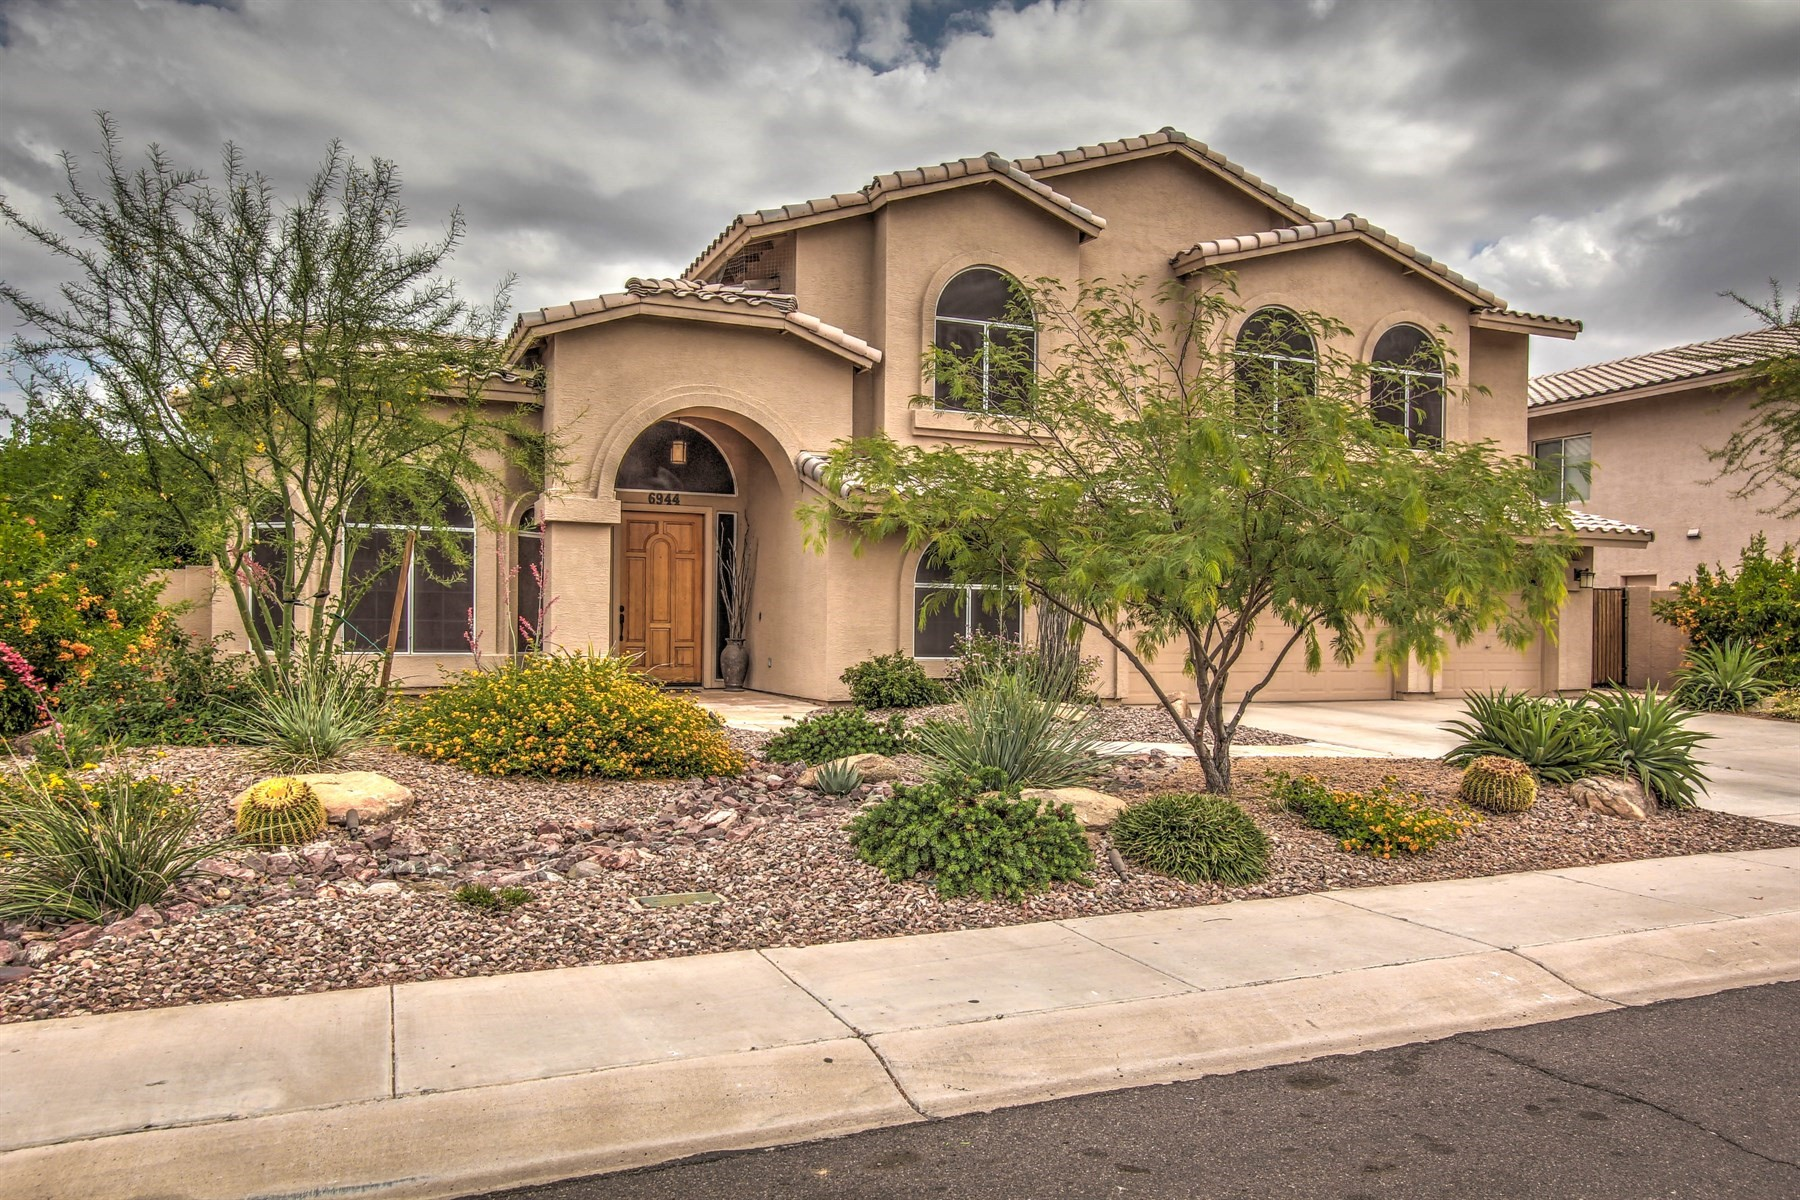 Casa para uma família para Venda às Impeccably maintained home in Desert Paradise Estates 6944 E Hearn Rd Scottsdale, Arizona, 85254 Estados Unidos